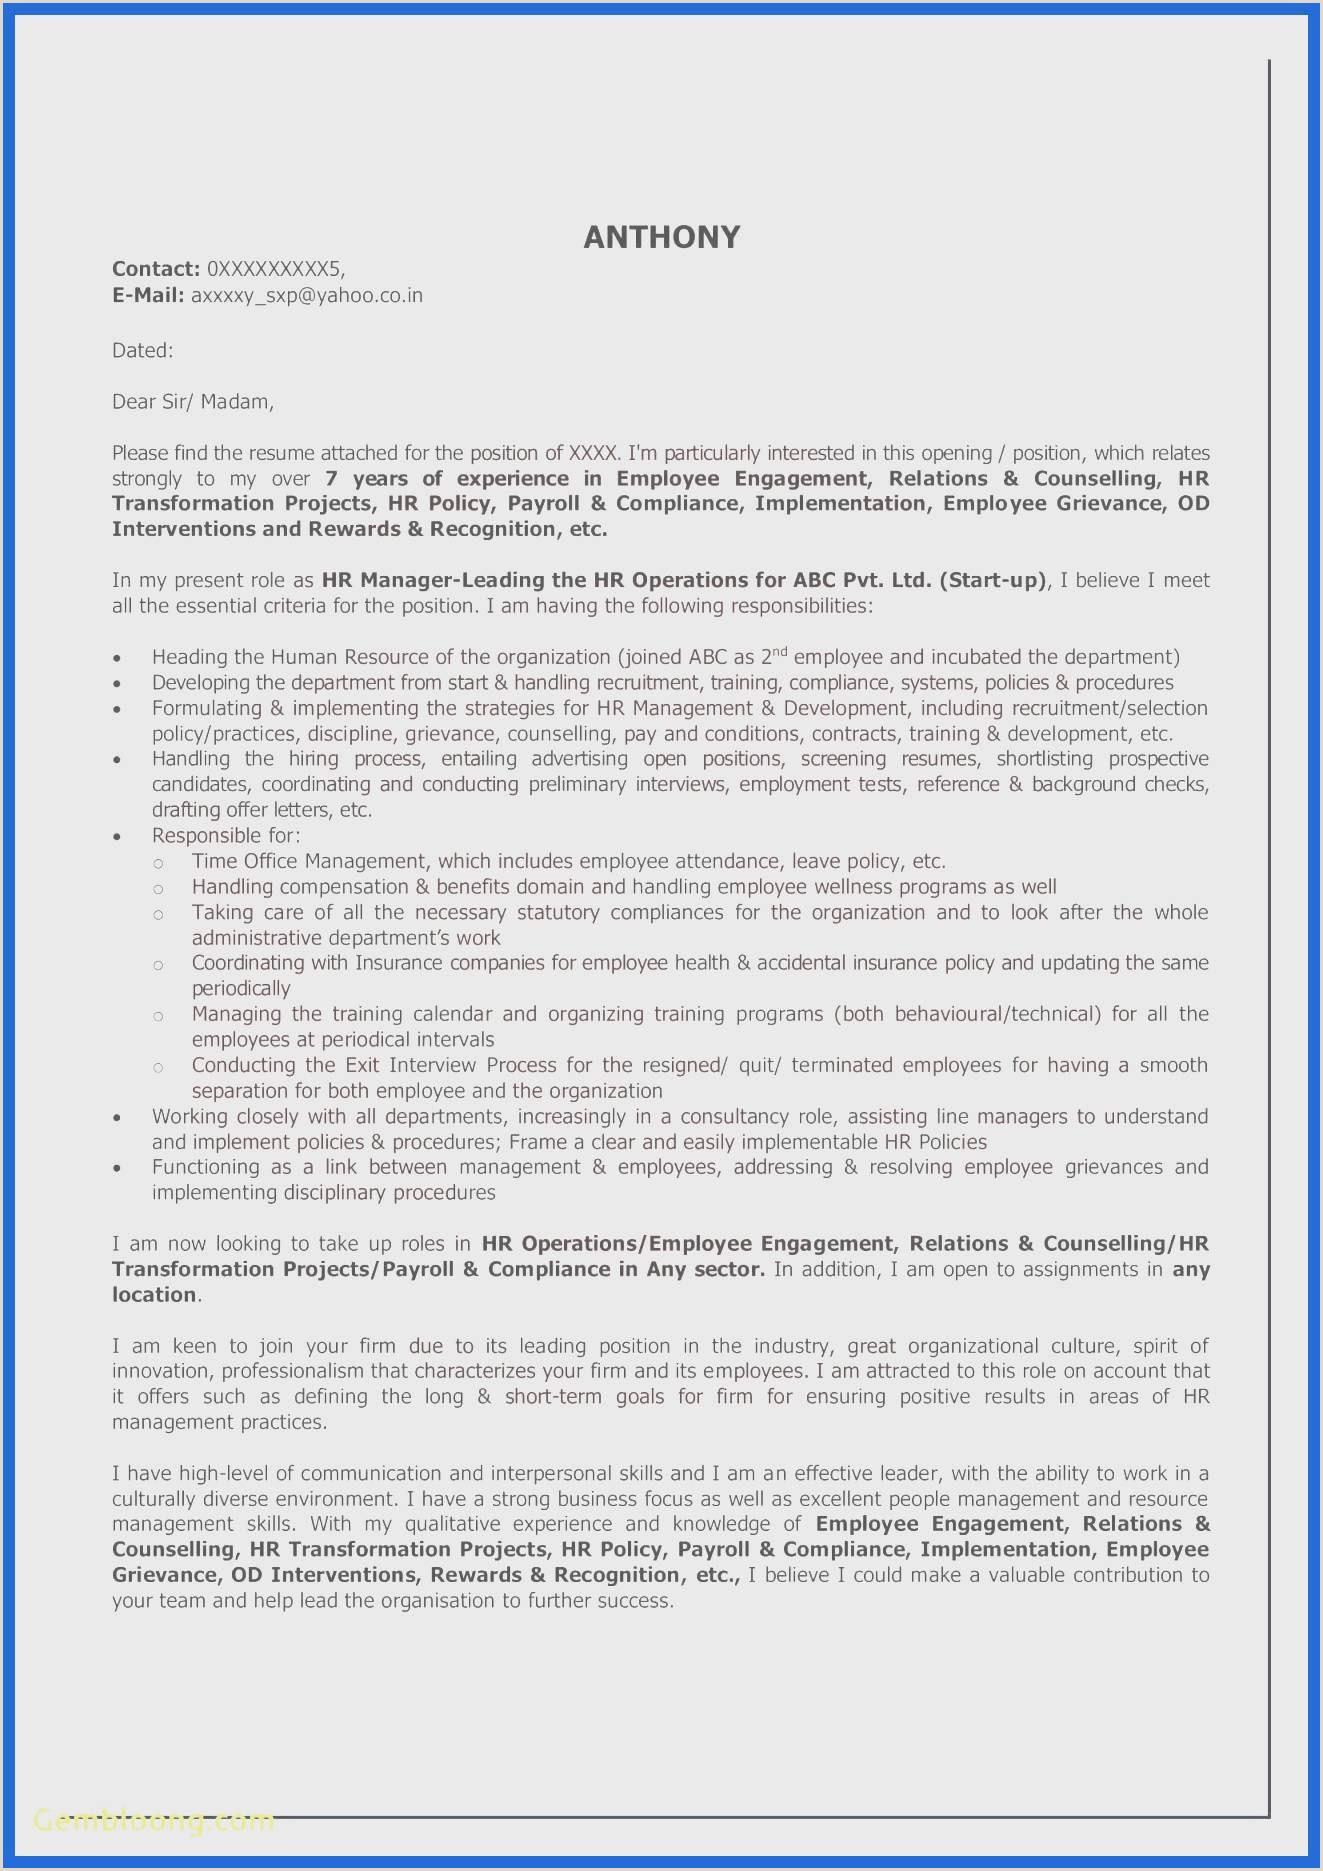 Resume format for Job Download Modele Cv Open Fice Meilleur De 10 Open Fice Resume